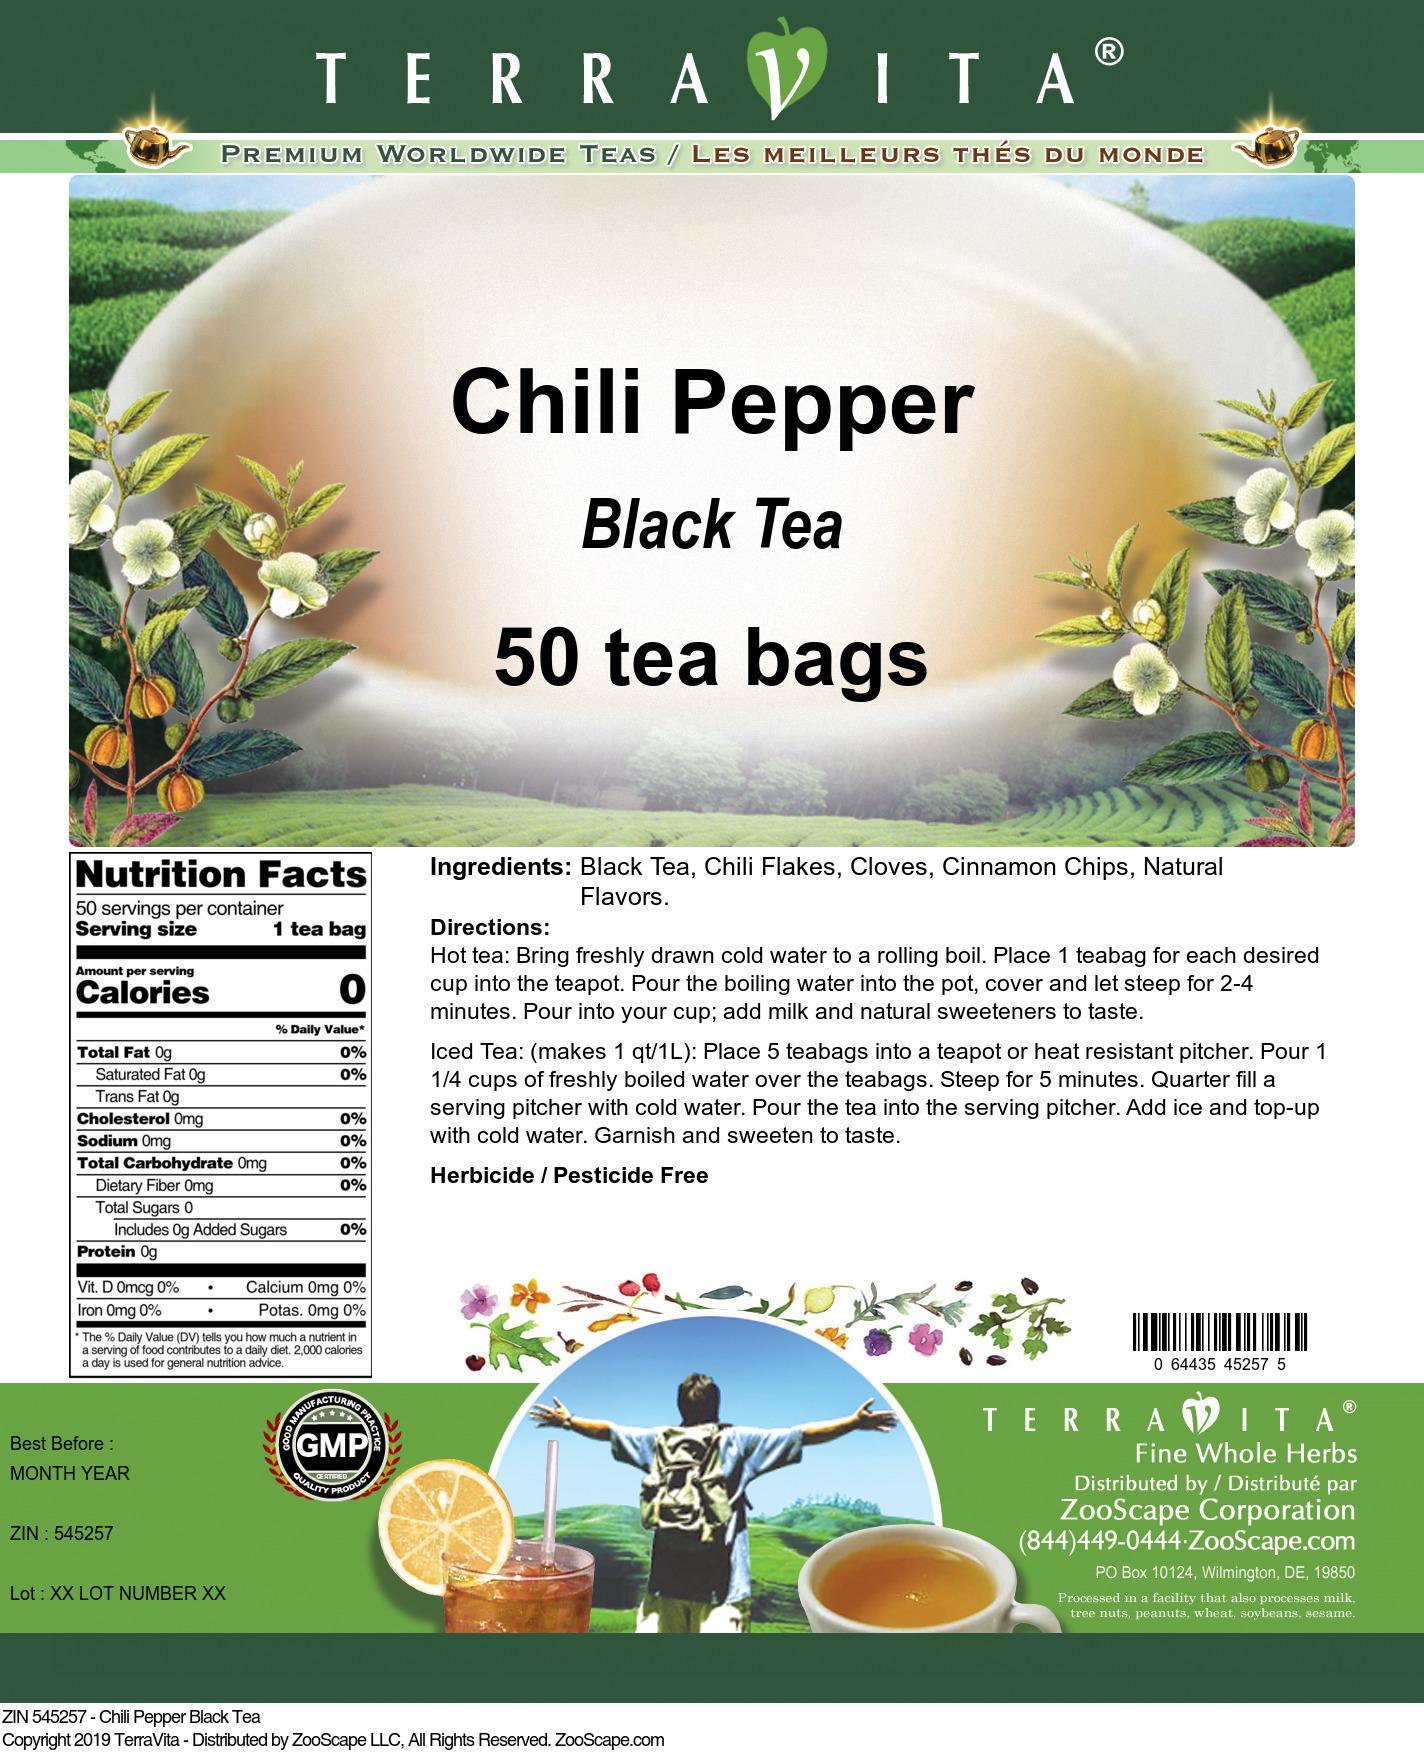 Chili Pepper Black Tea